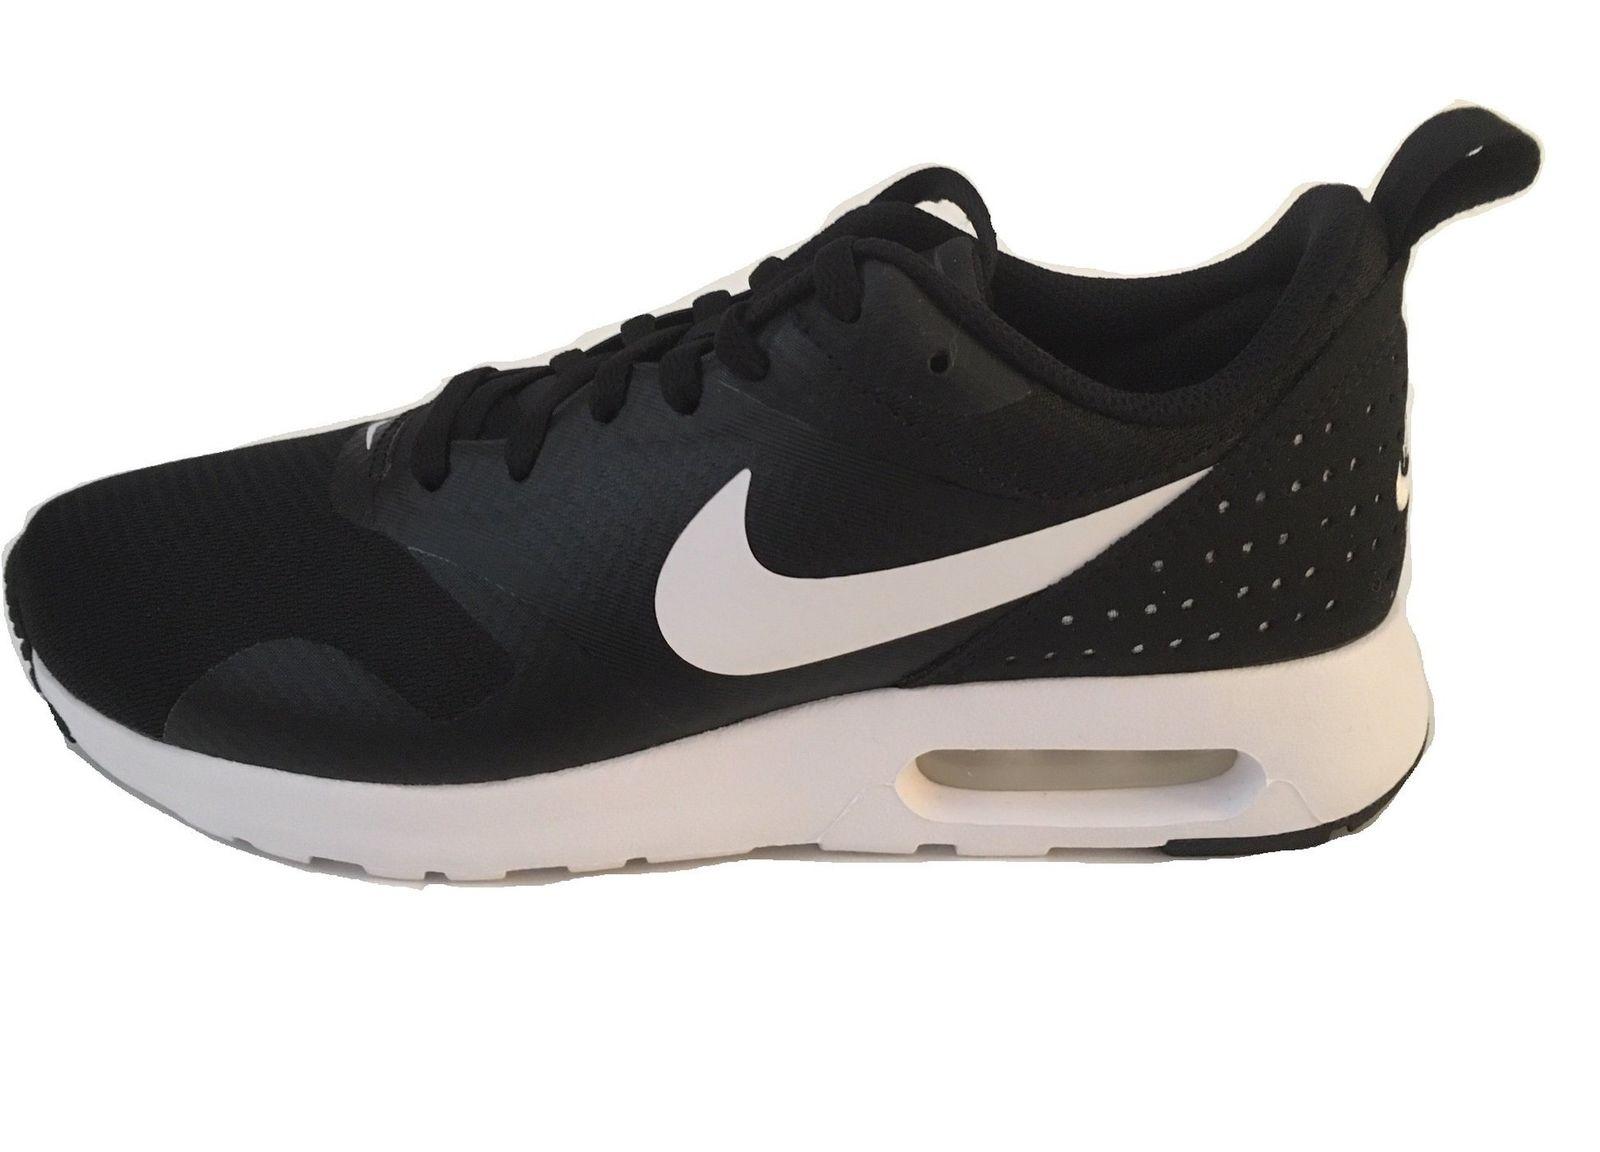 new style 45770 f5ef7 ... uk nike womens air max tavas running shoes black white 916791 001 size  7.5 bm 6124c